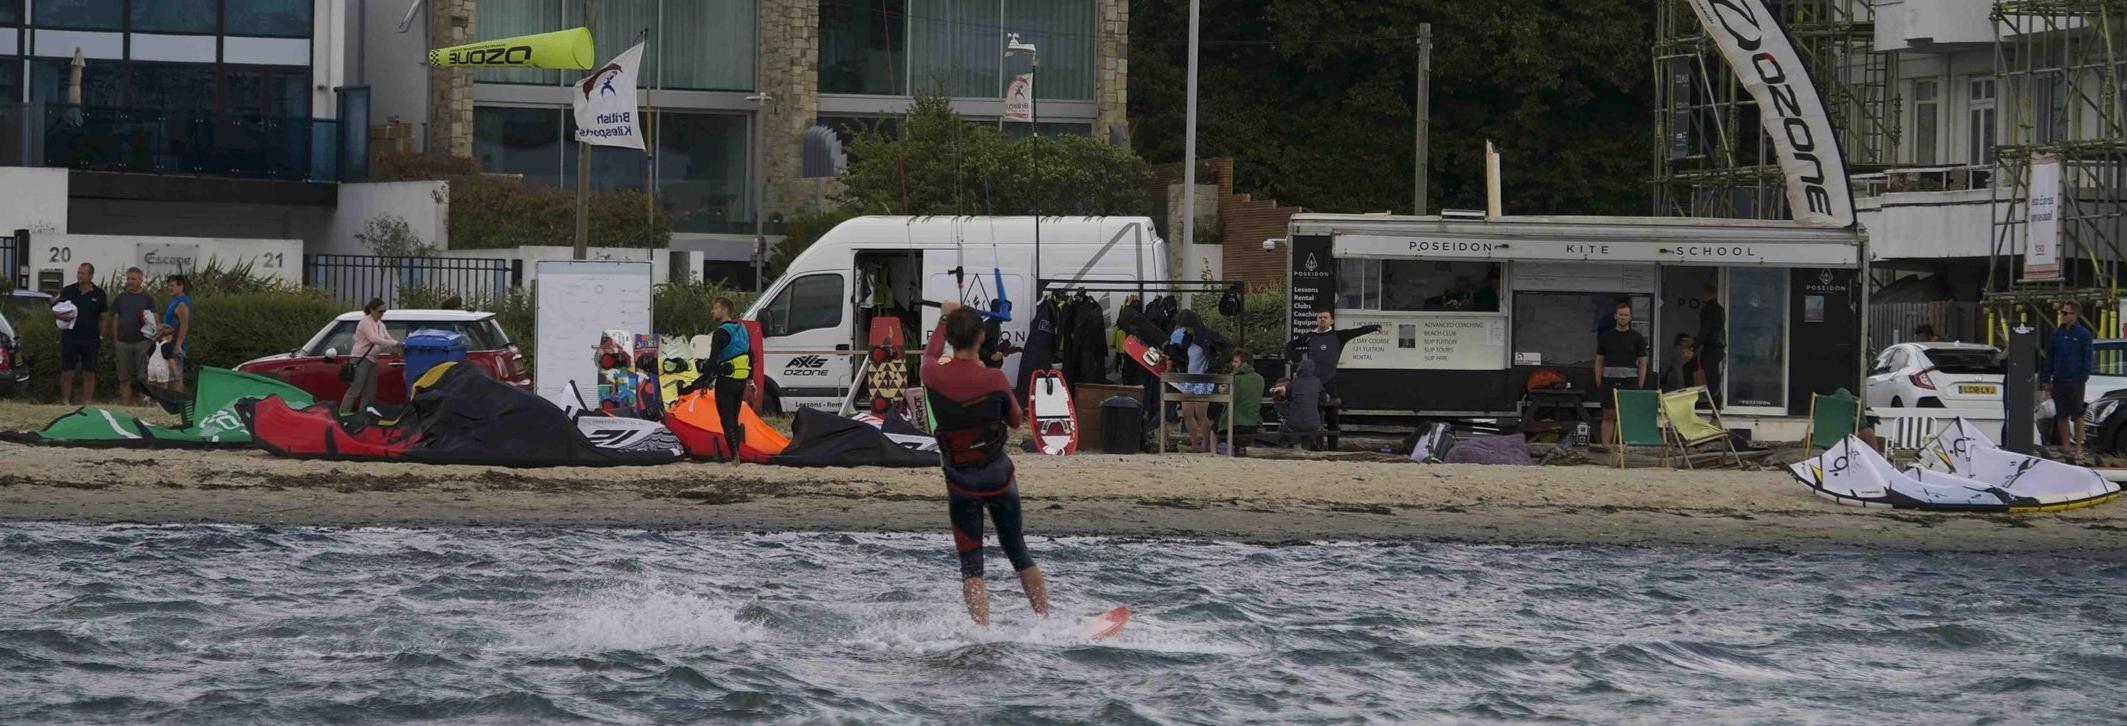 poole_harbour_kitesurf_logan_jezard.jpg